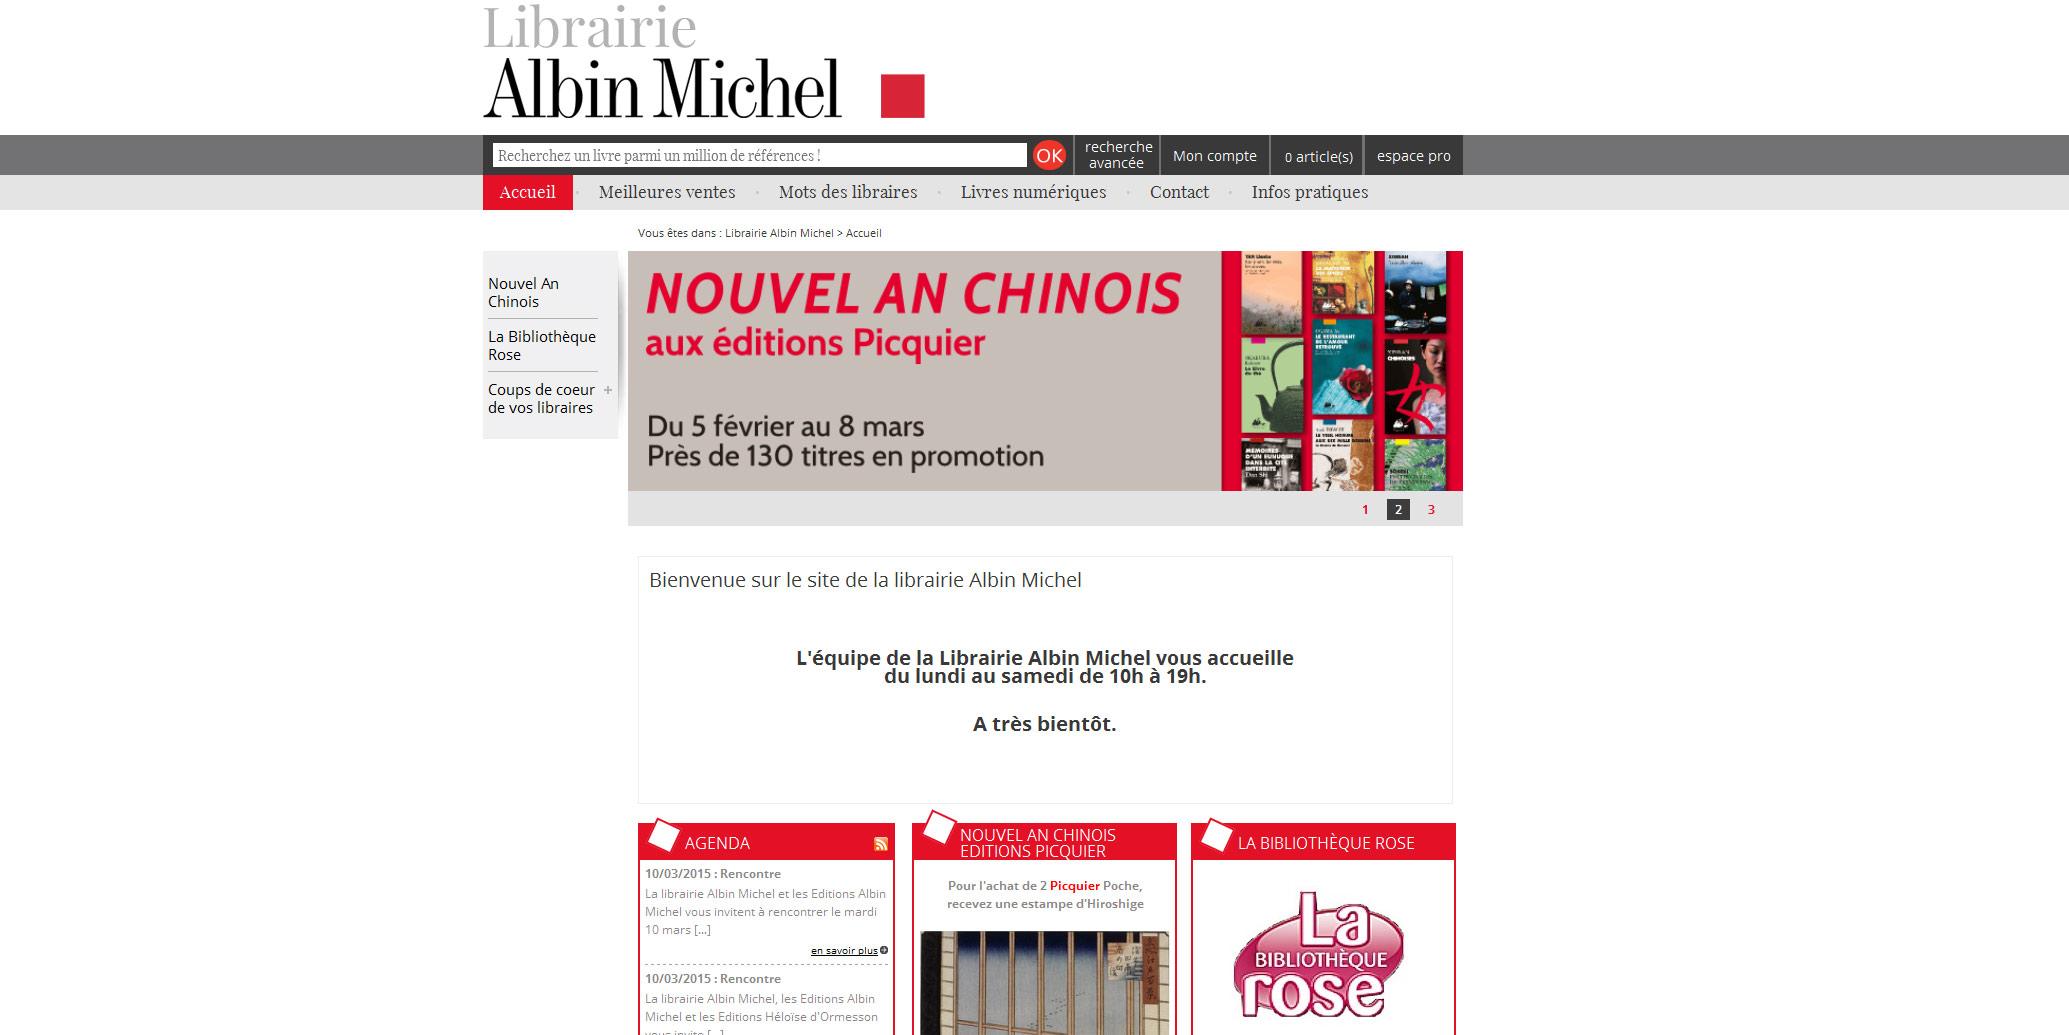 Librairie Albin Michel